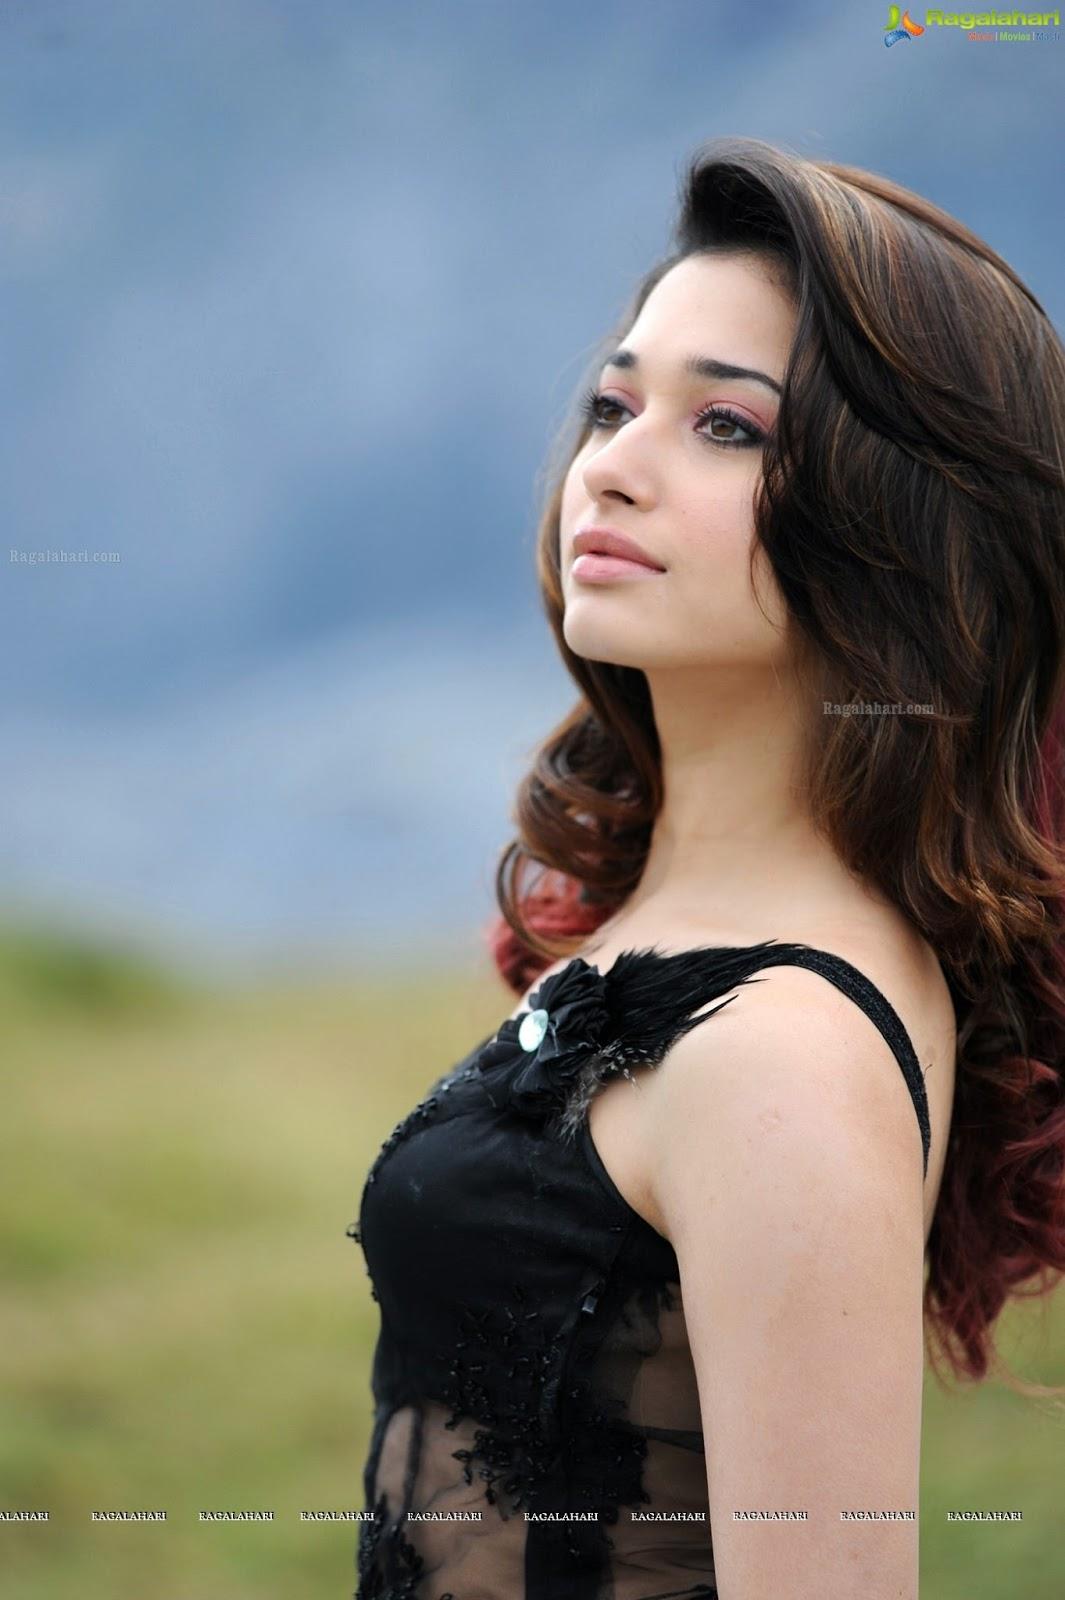 Tamanna Back: Navel Heroines: Tamanna Bhatia Cute,hot,wet Stills